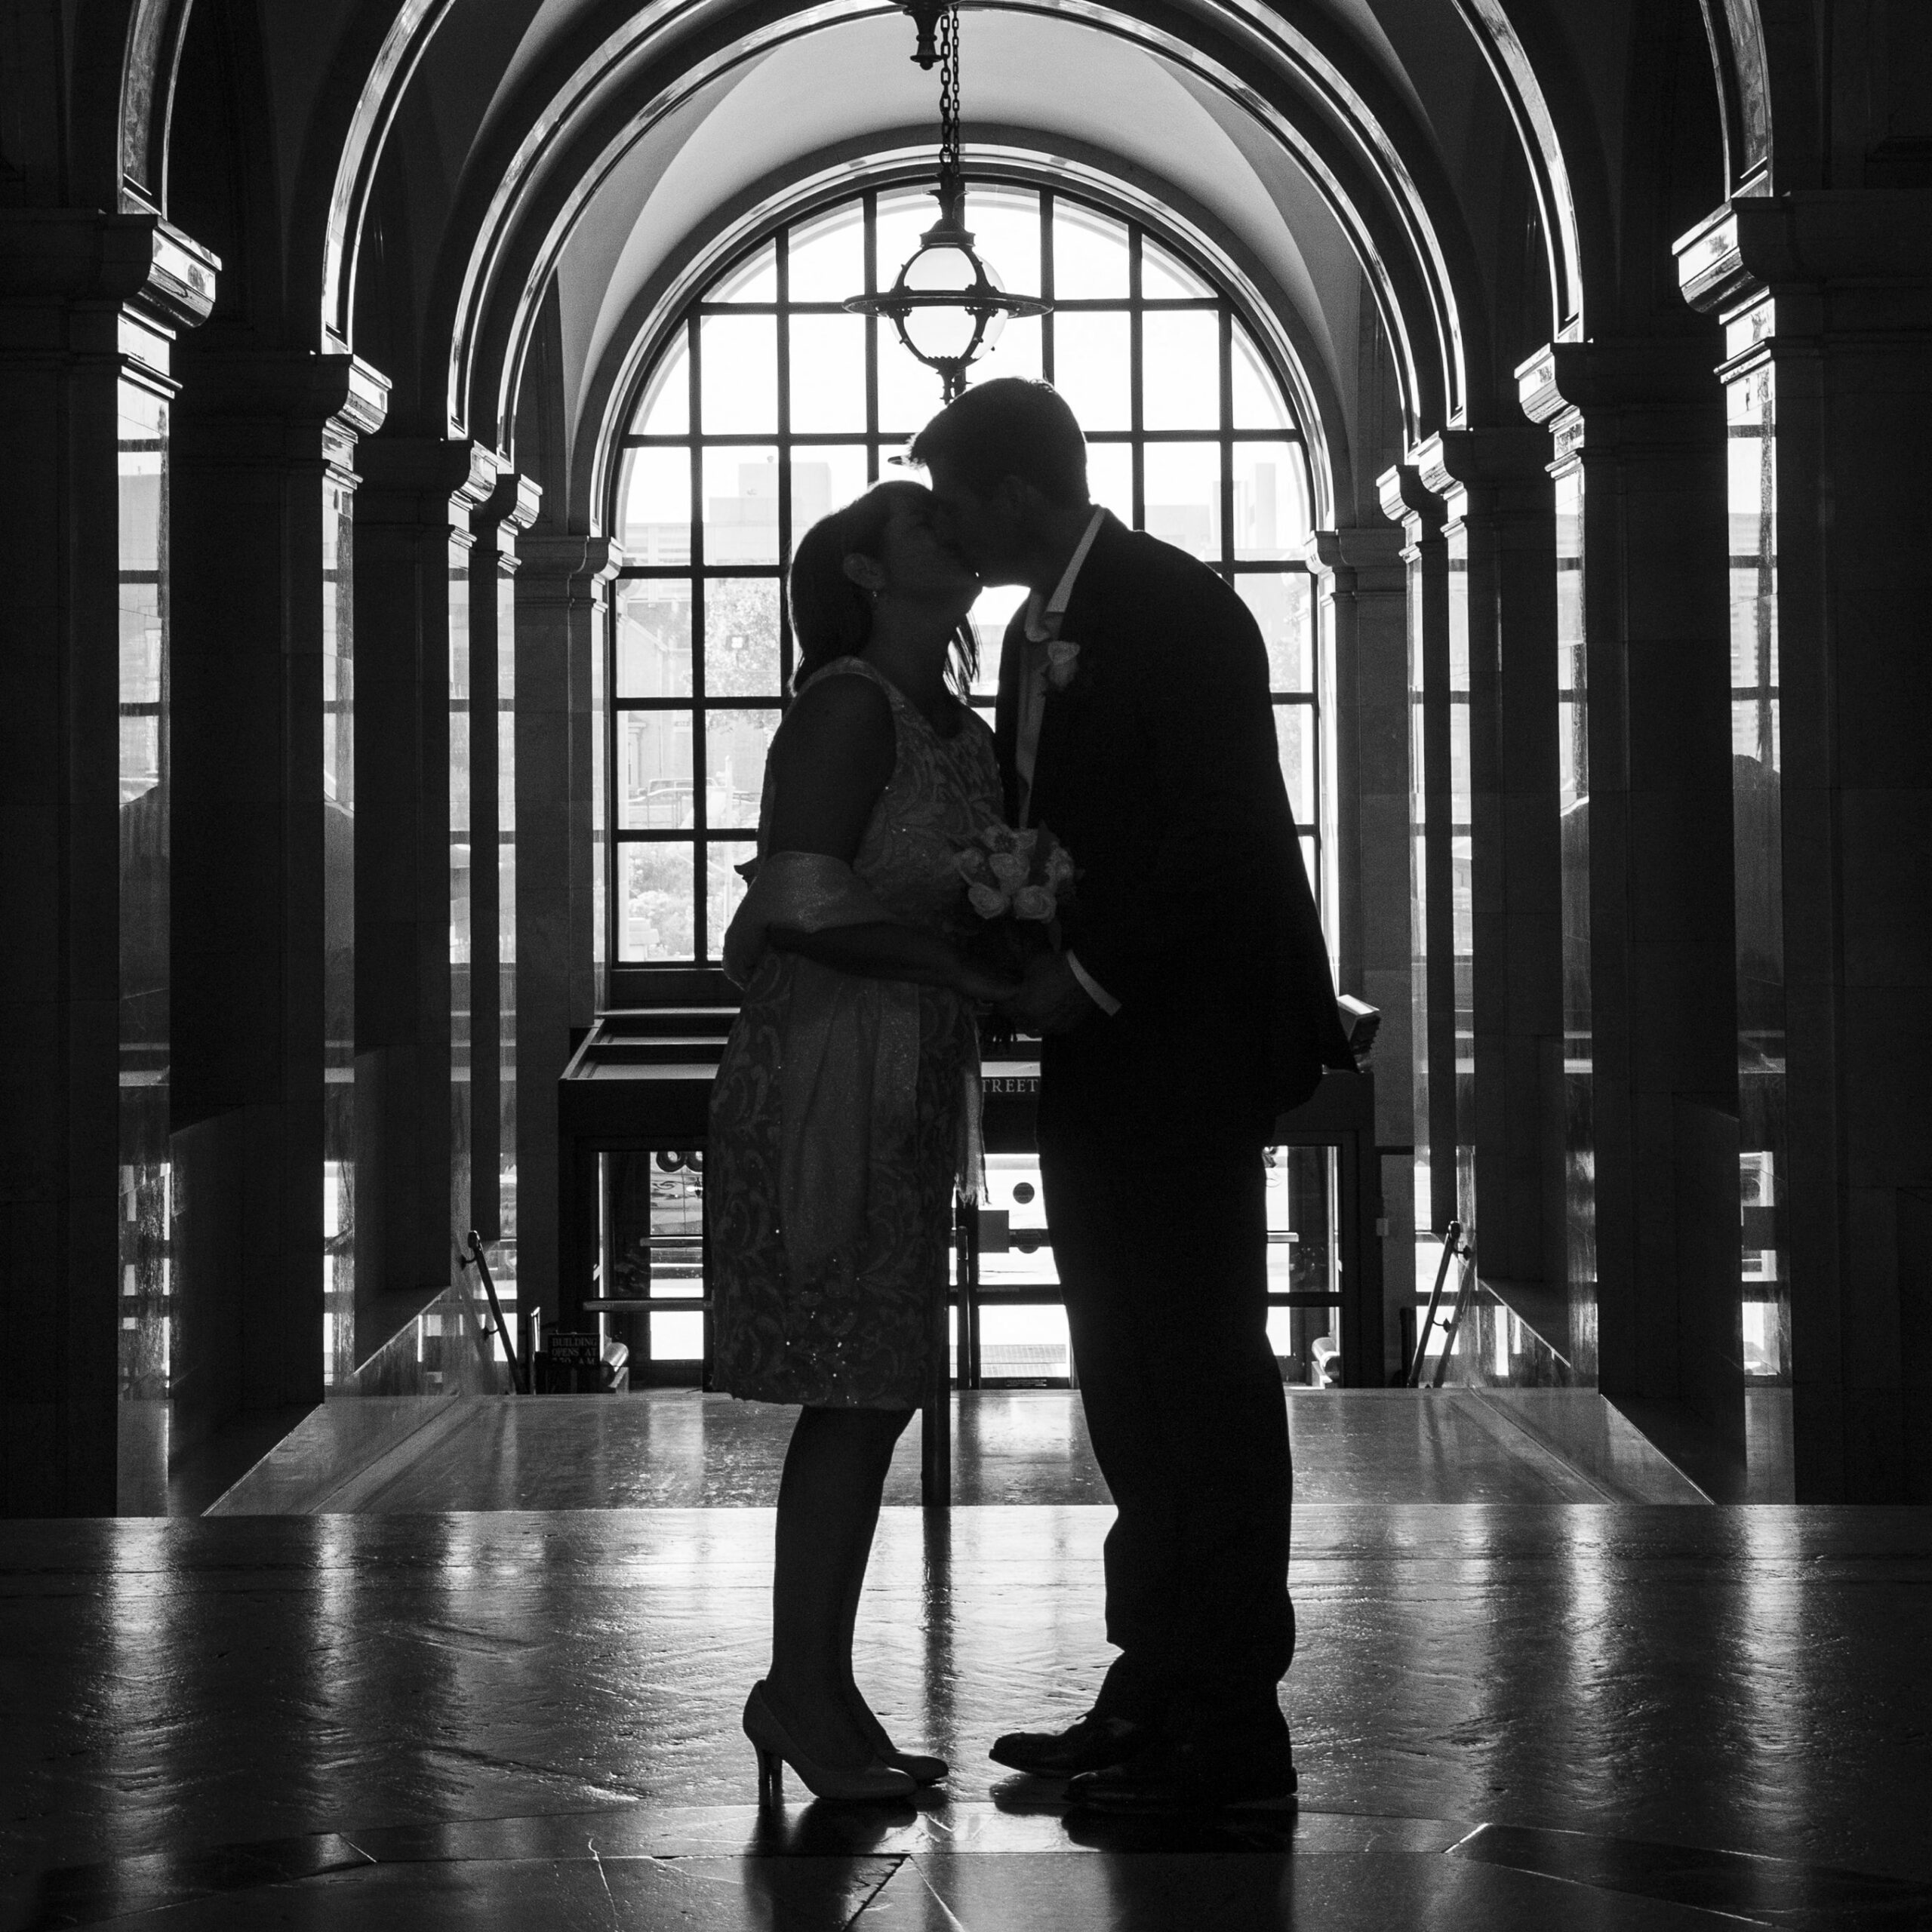 Courthouse Wedding Photographer Milwaukee WI S